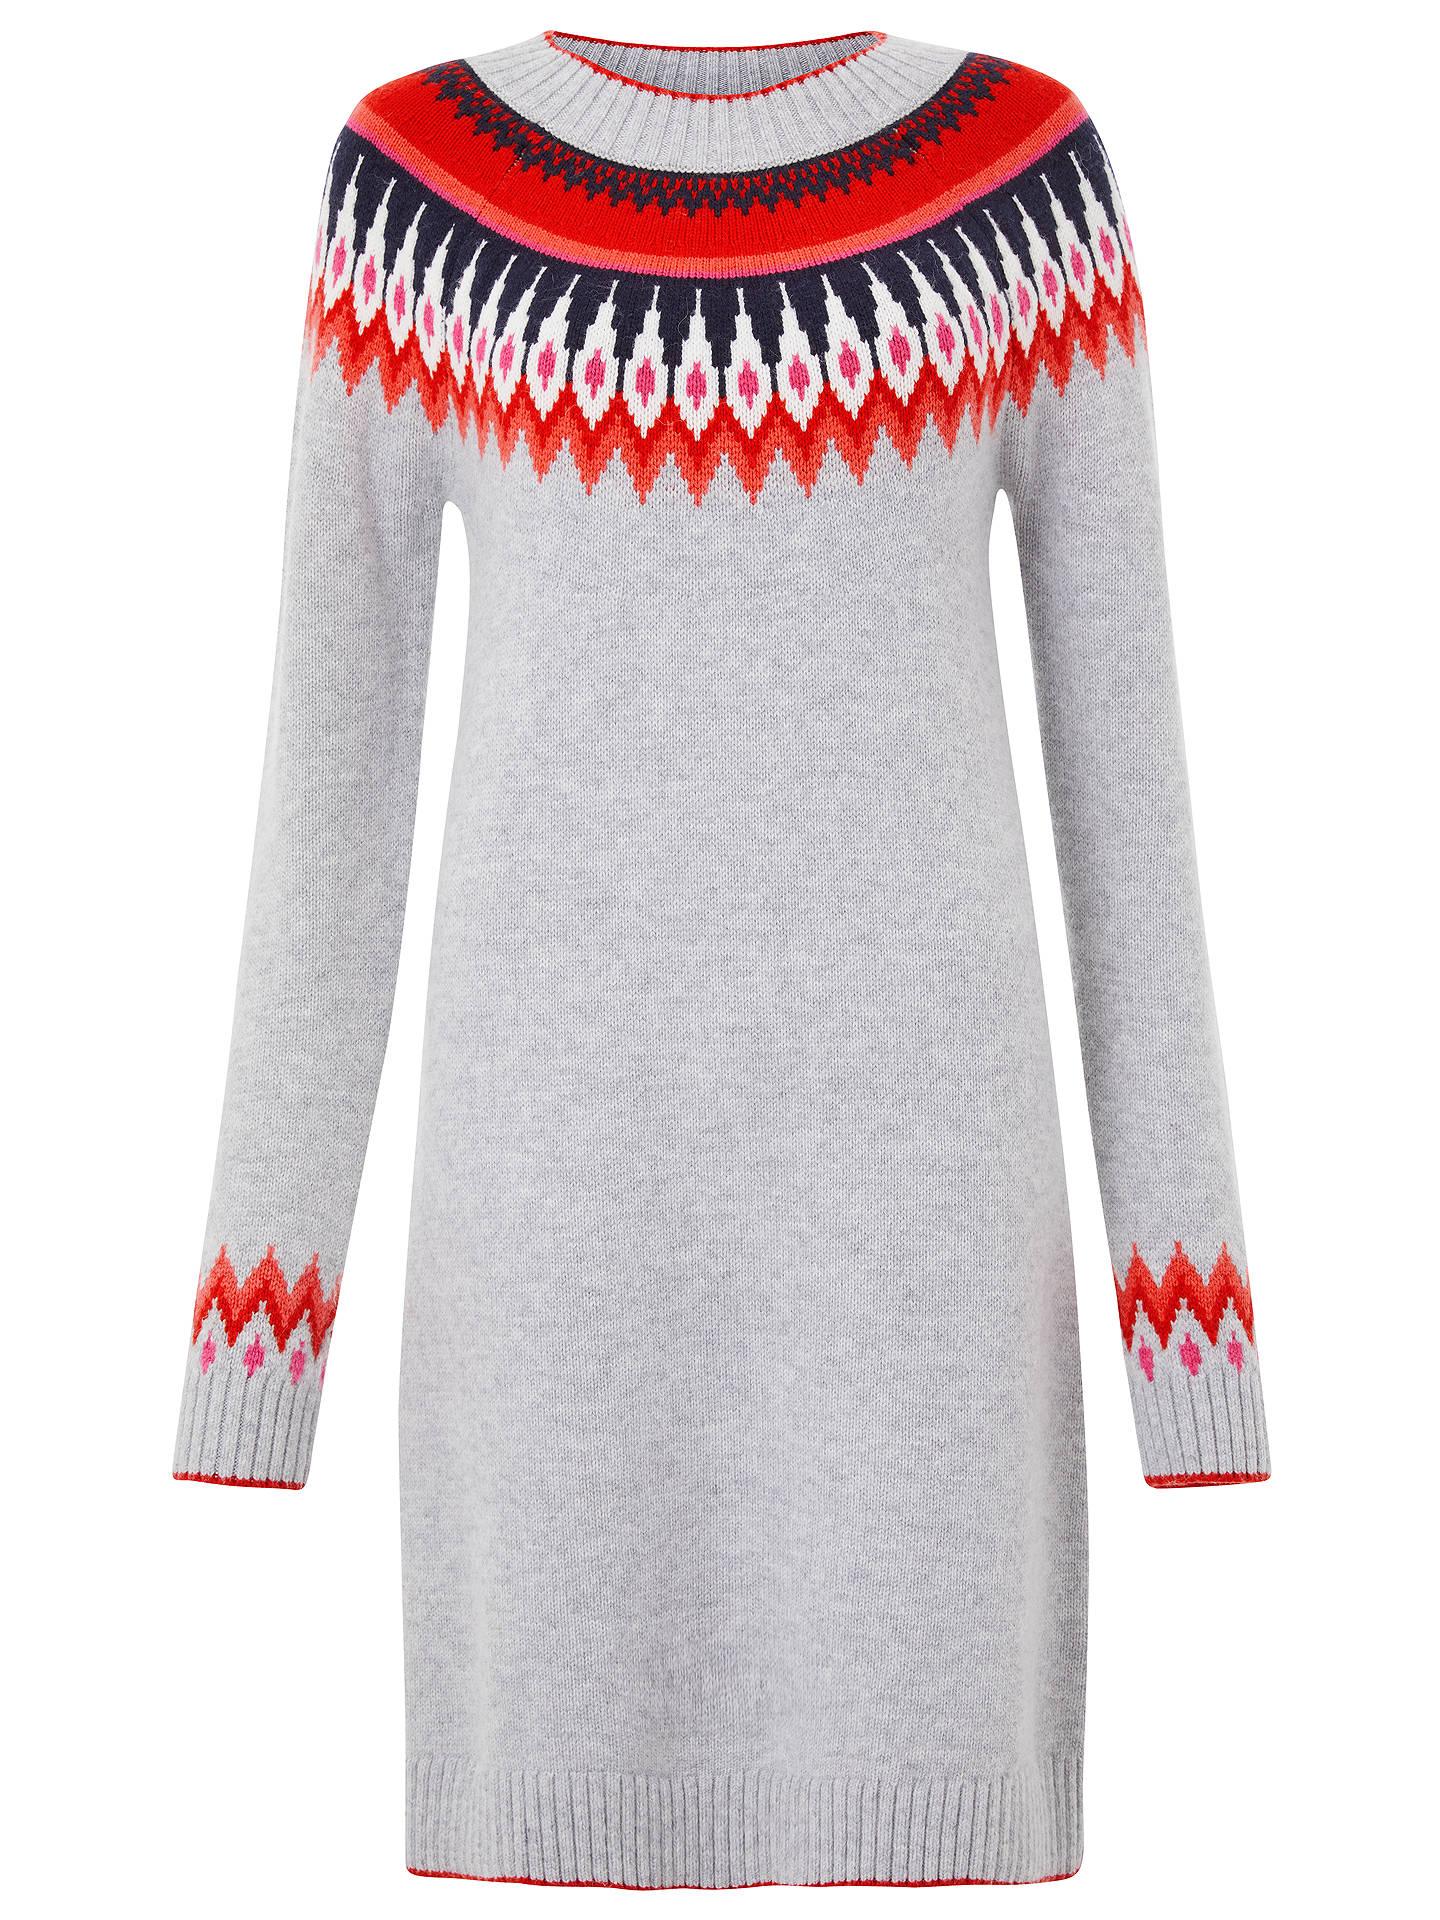 1bb4664b424 Buy Boden Fair Isle Agnes Jumper Dress